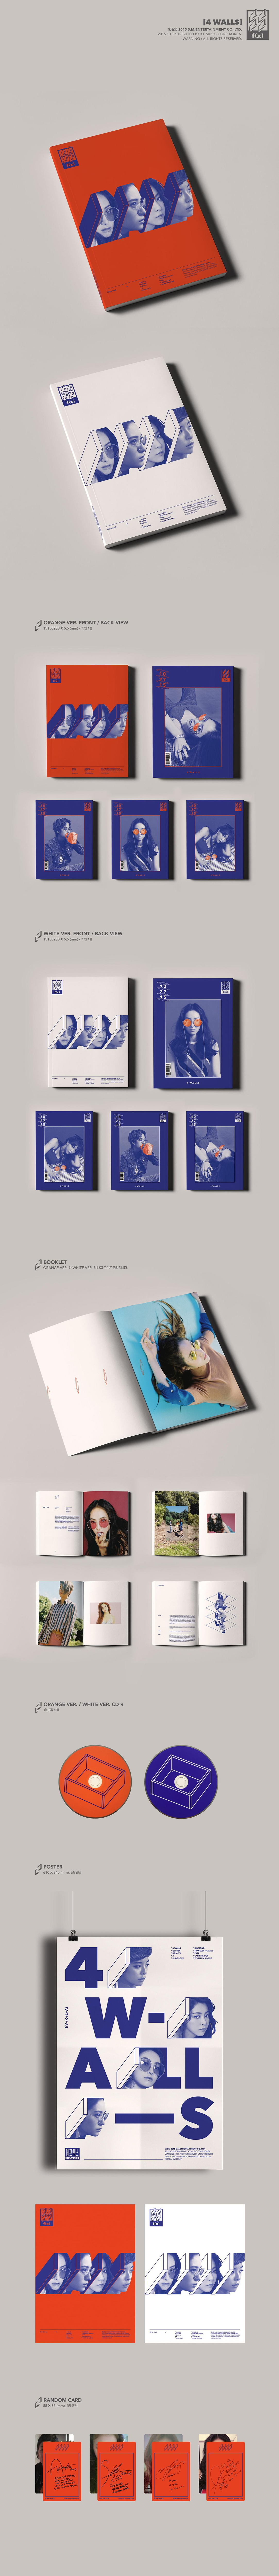 F(x) 4 Walls album packaging detail.png